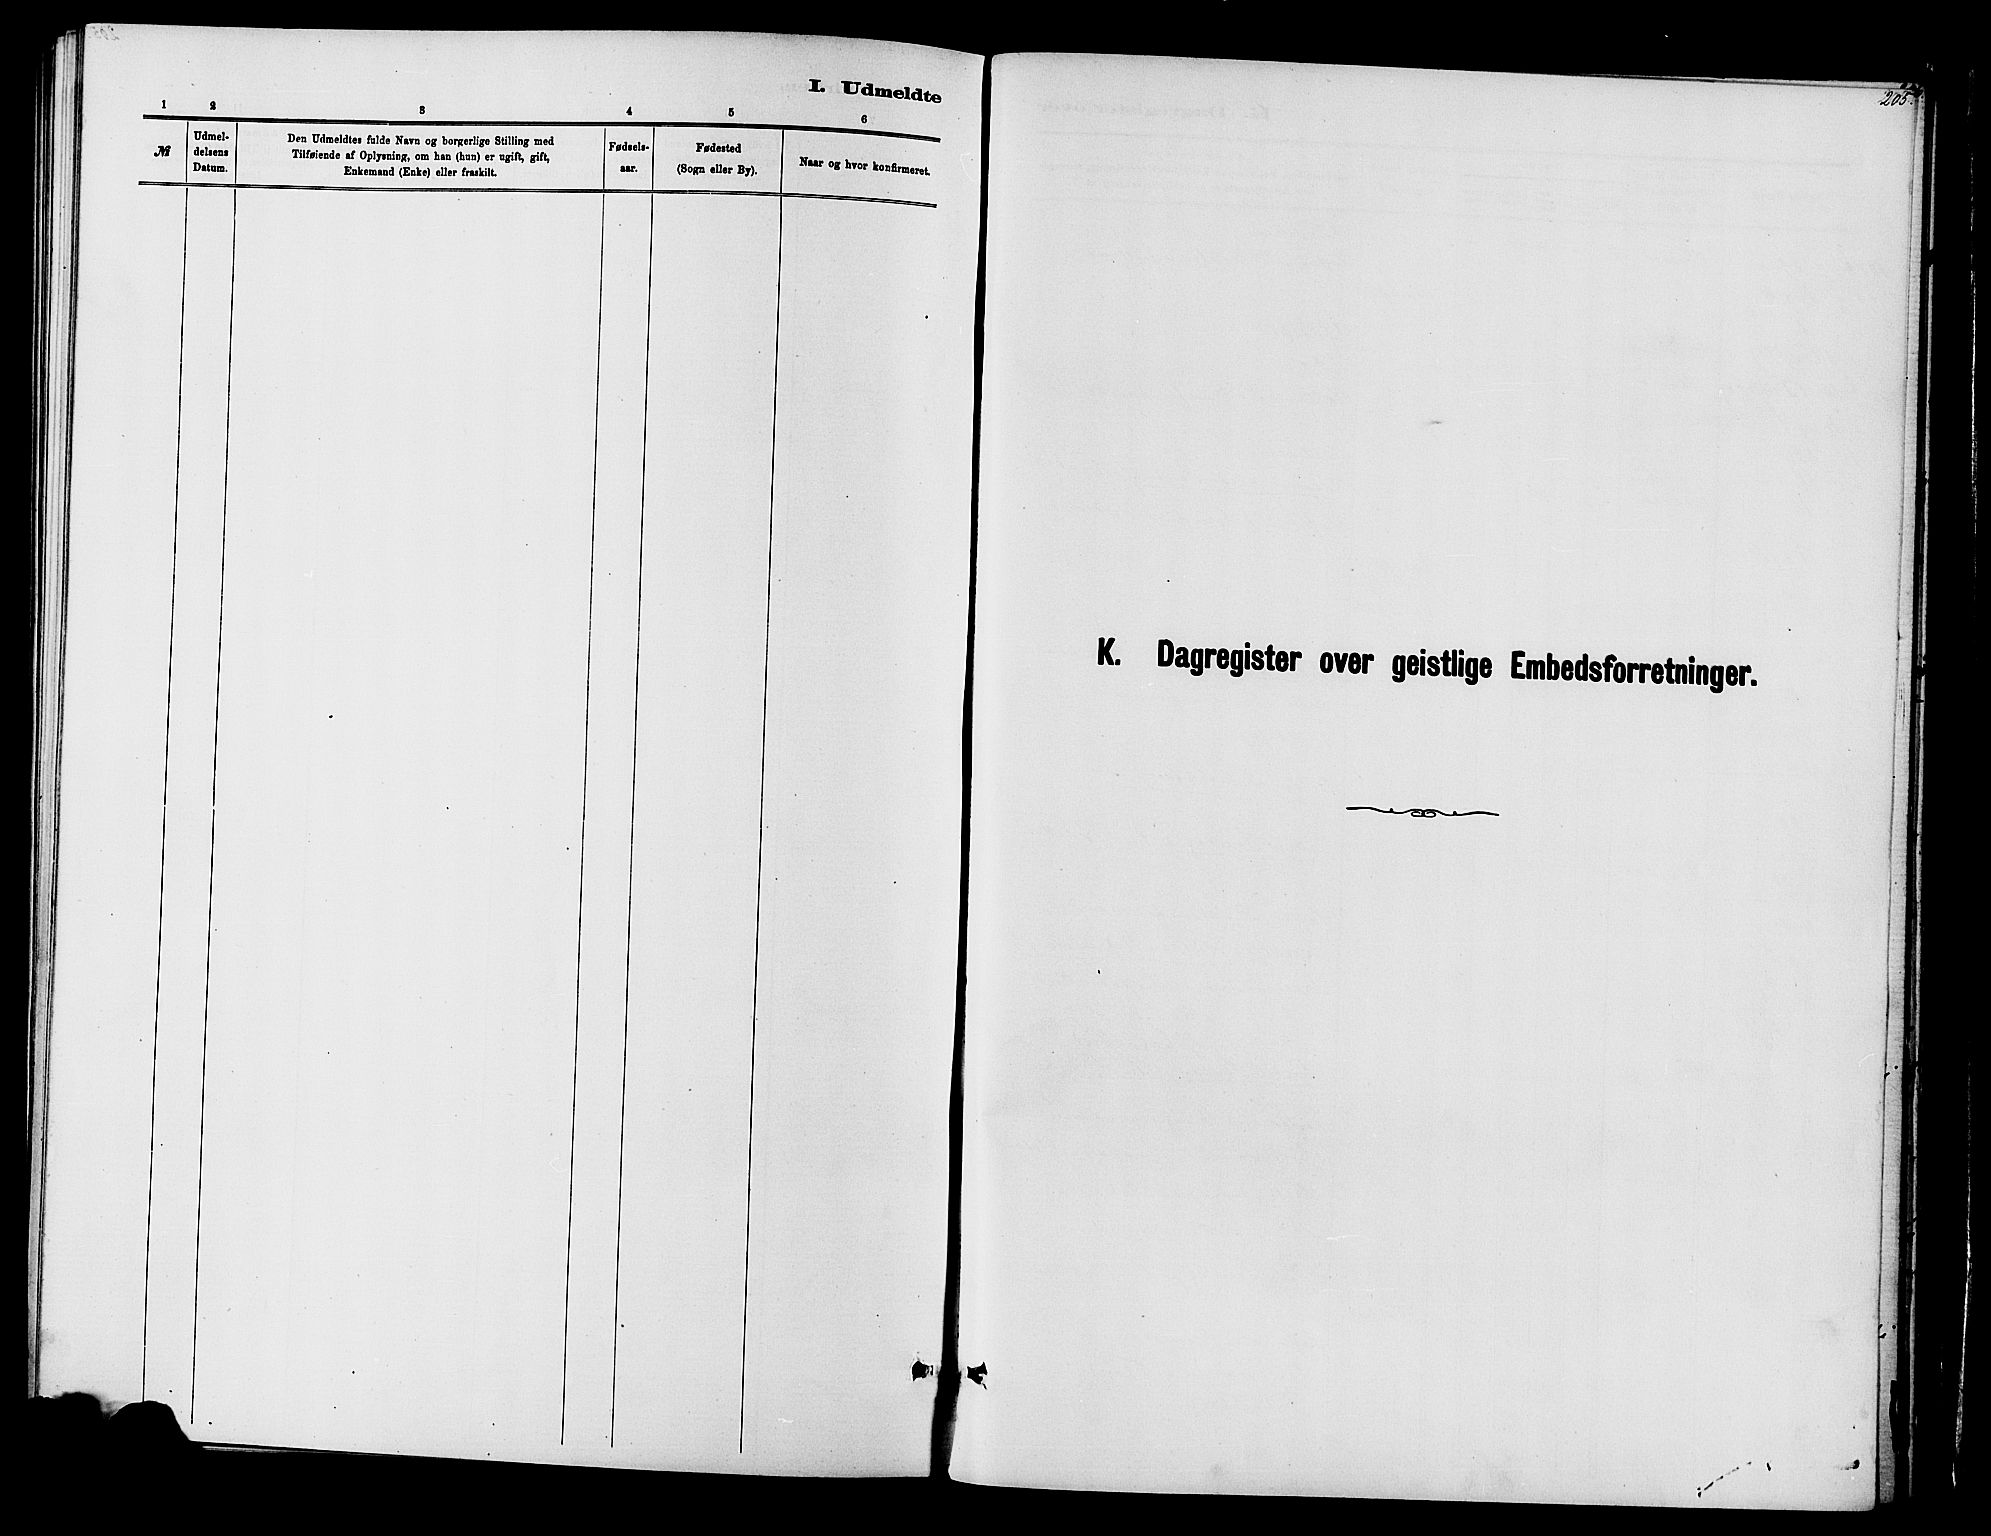 SAH, Vardal prestekontor, H/Ha/Haa/L0010: Ministerialbok nr. 10, 1878-1893, s. 205